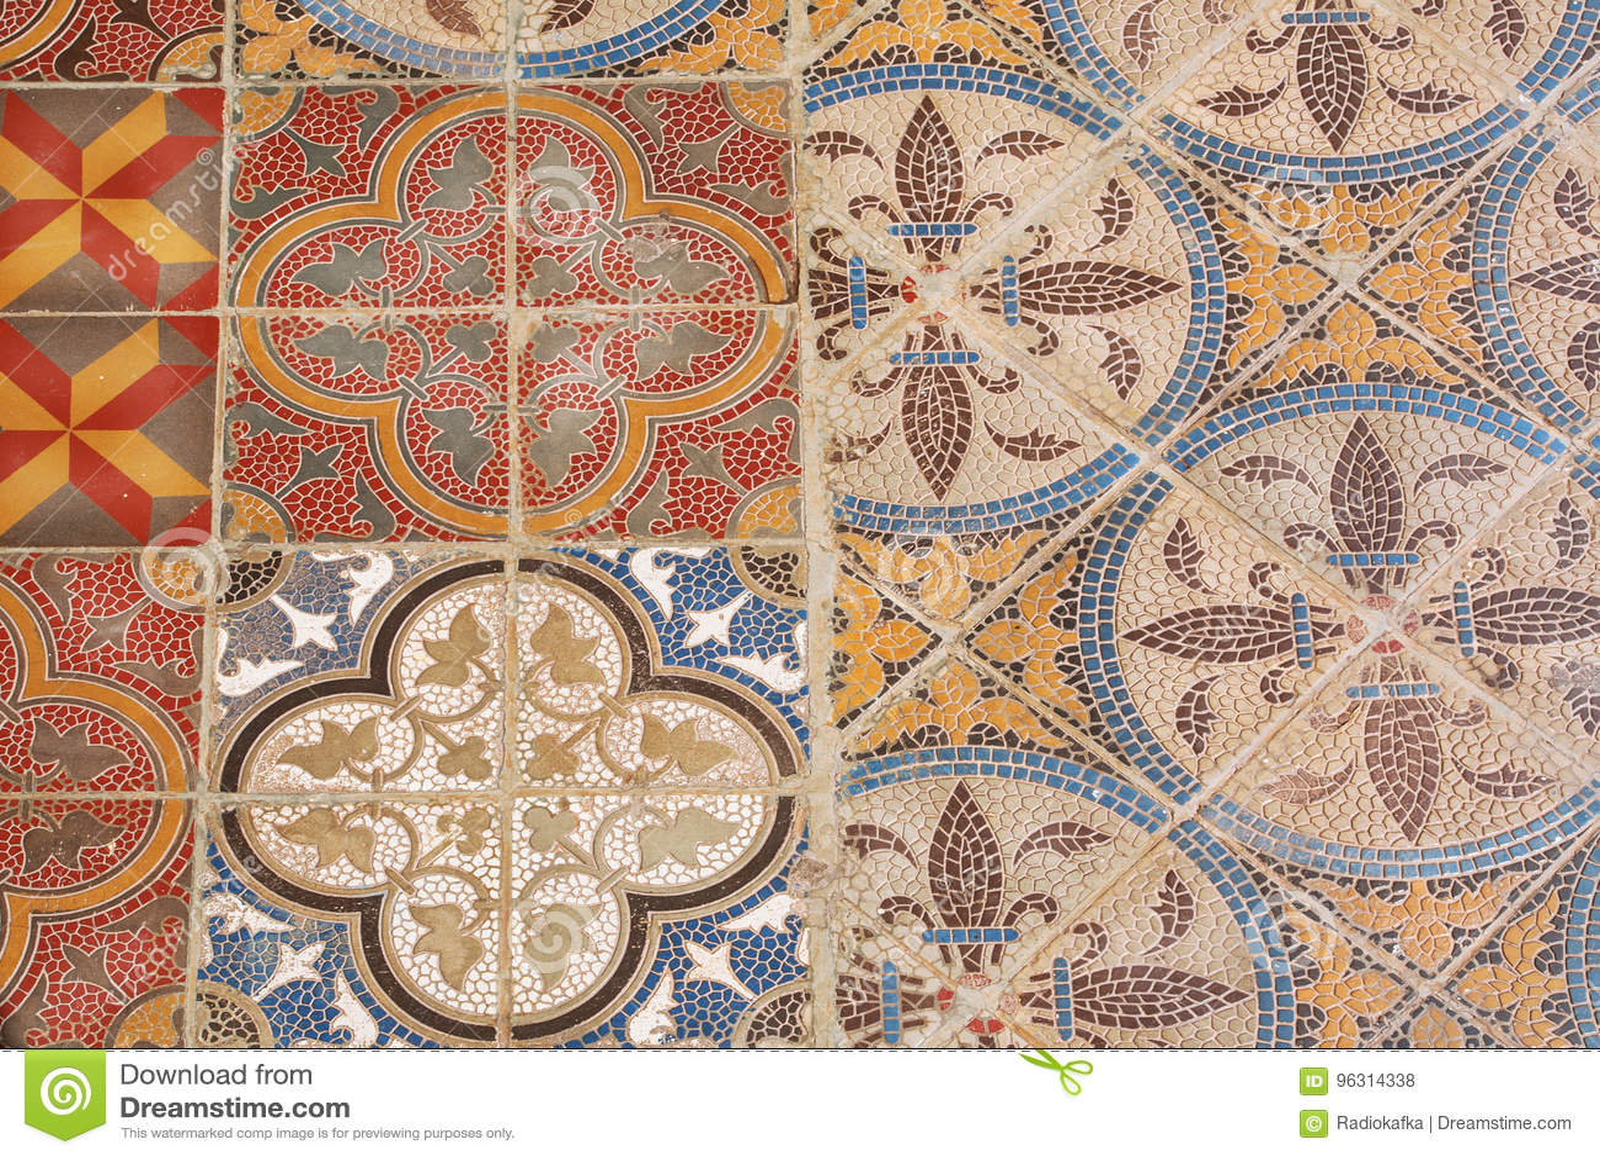 Patterned ceramic tile tiles 20x20 patterned ceramic tile royaltyfree stock photo download colorful vintage style ceramic tile retro patterned doublecrazyfo Choice Image